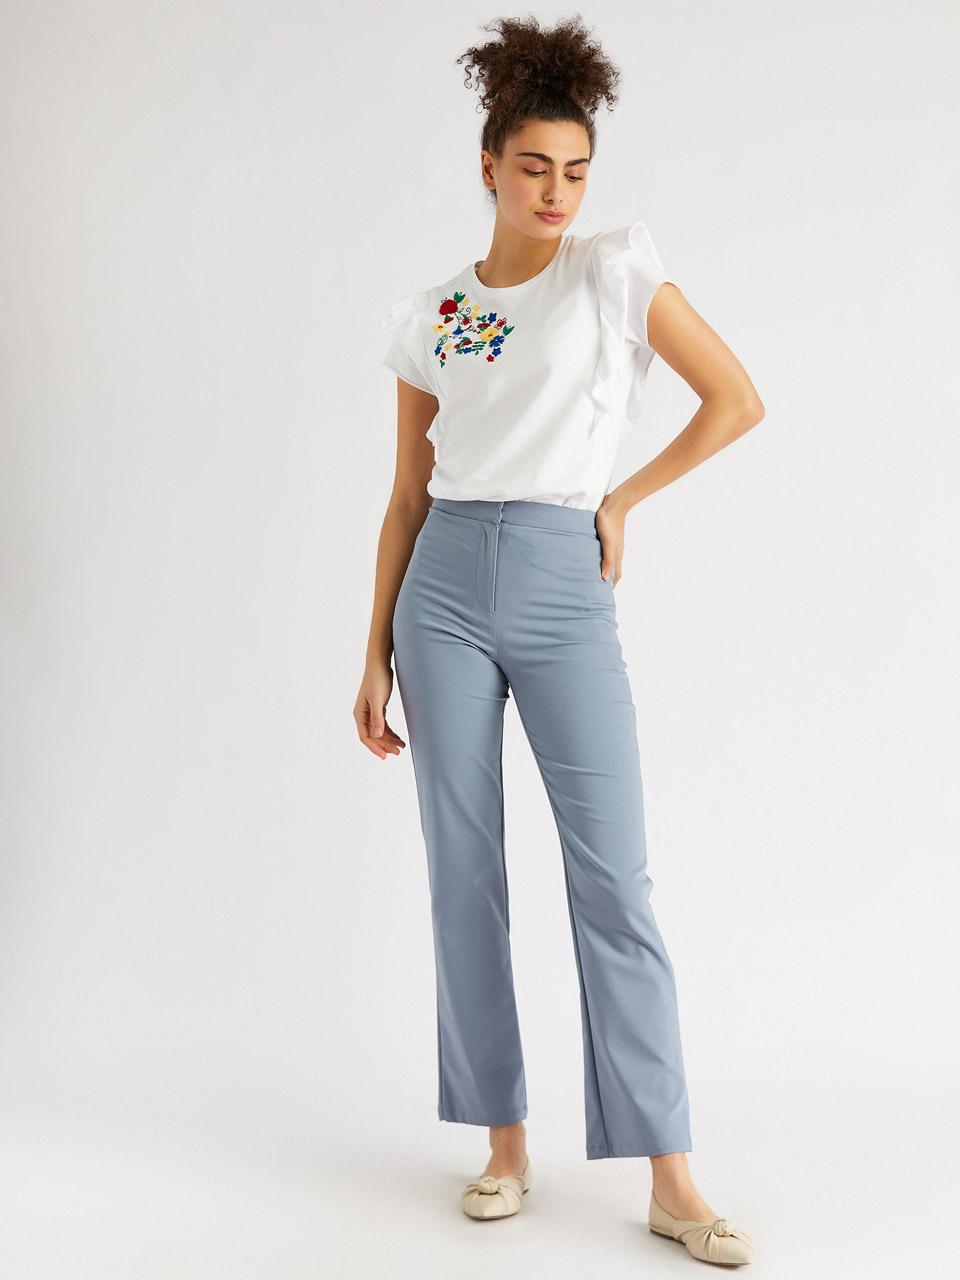 Classic Cut Cotton Trousers